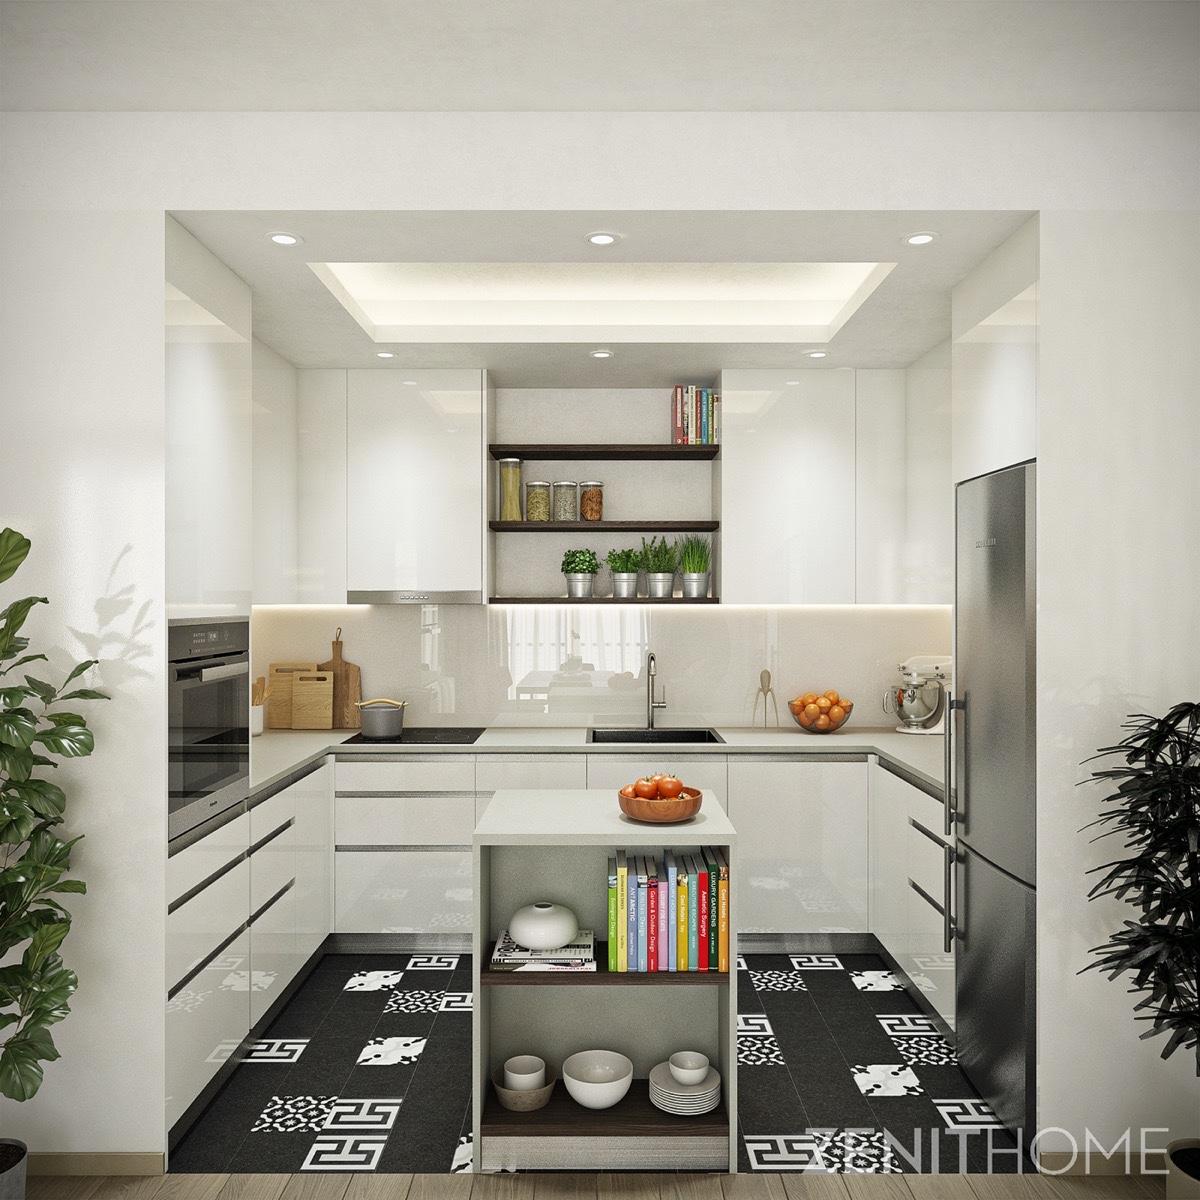 70s-Scandinavian-kitchen-cube-design-silver-and-black-tiled-floor